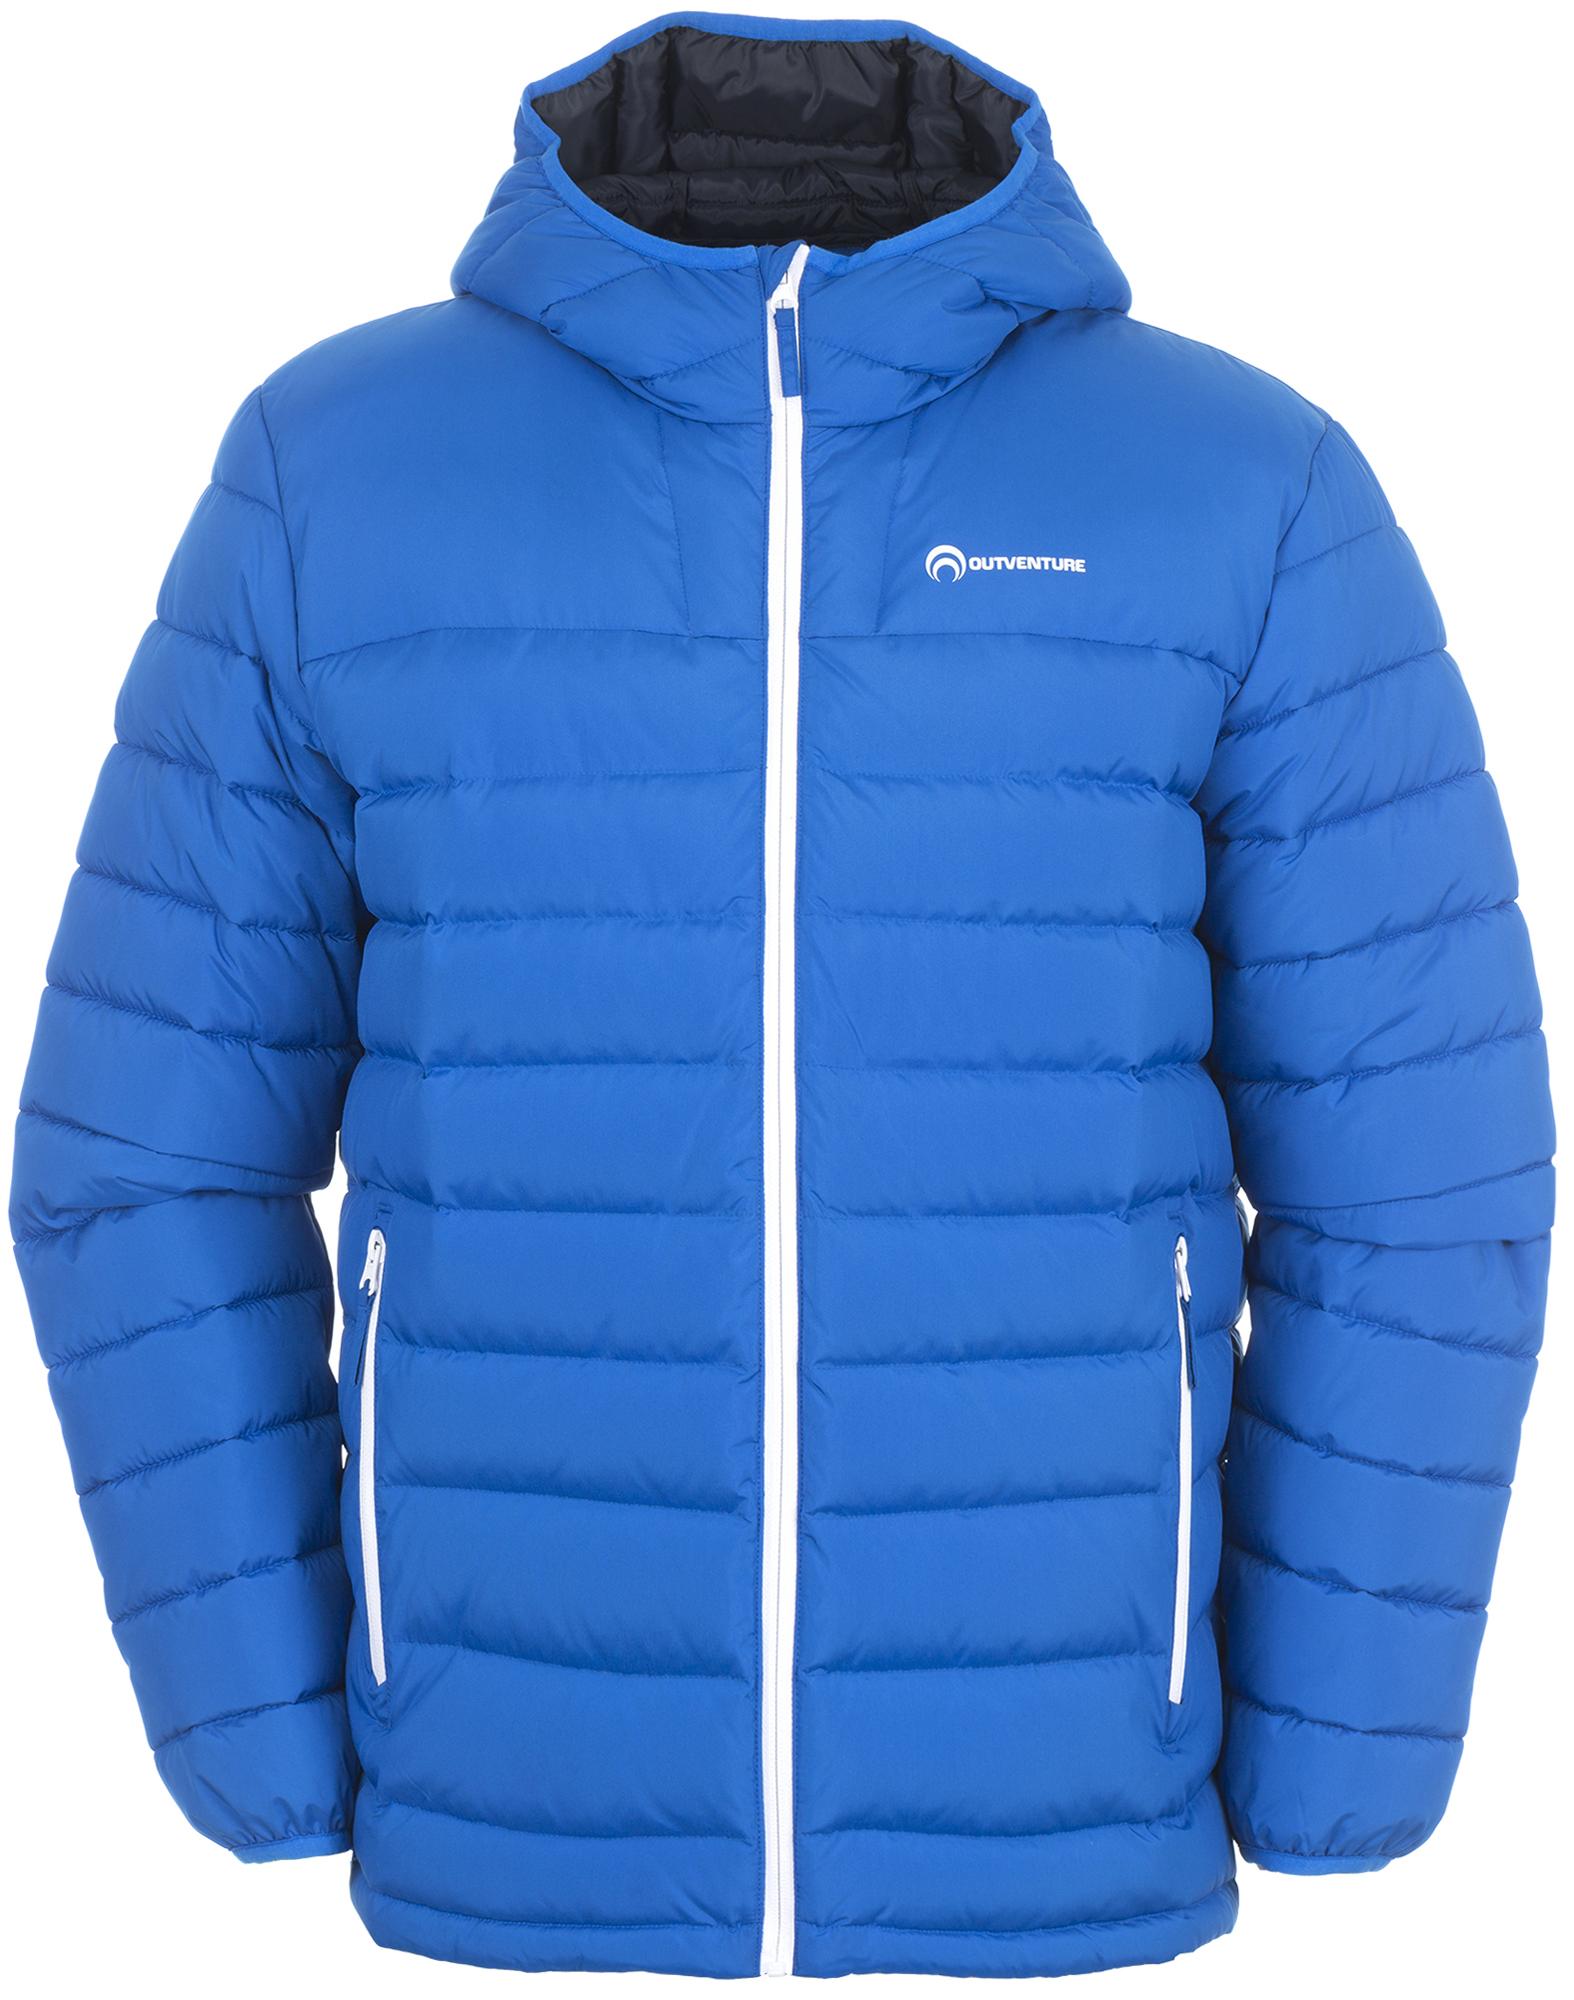 Outventure Куртка пуховая мужская Outventure недорого